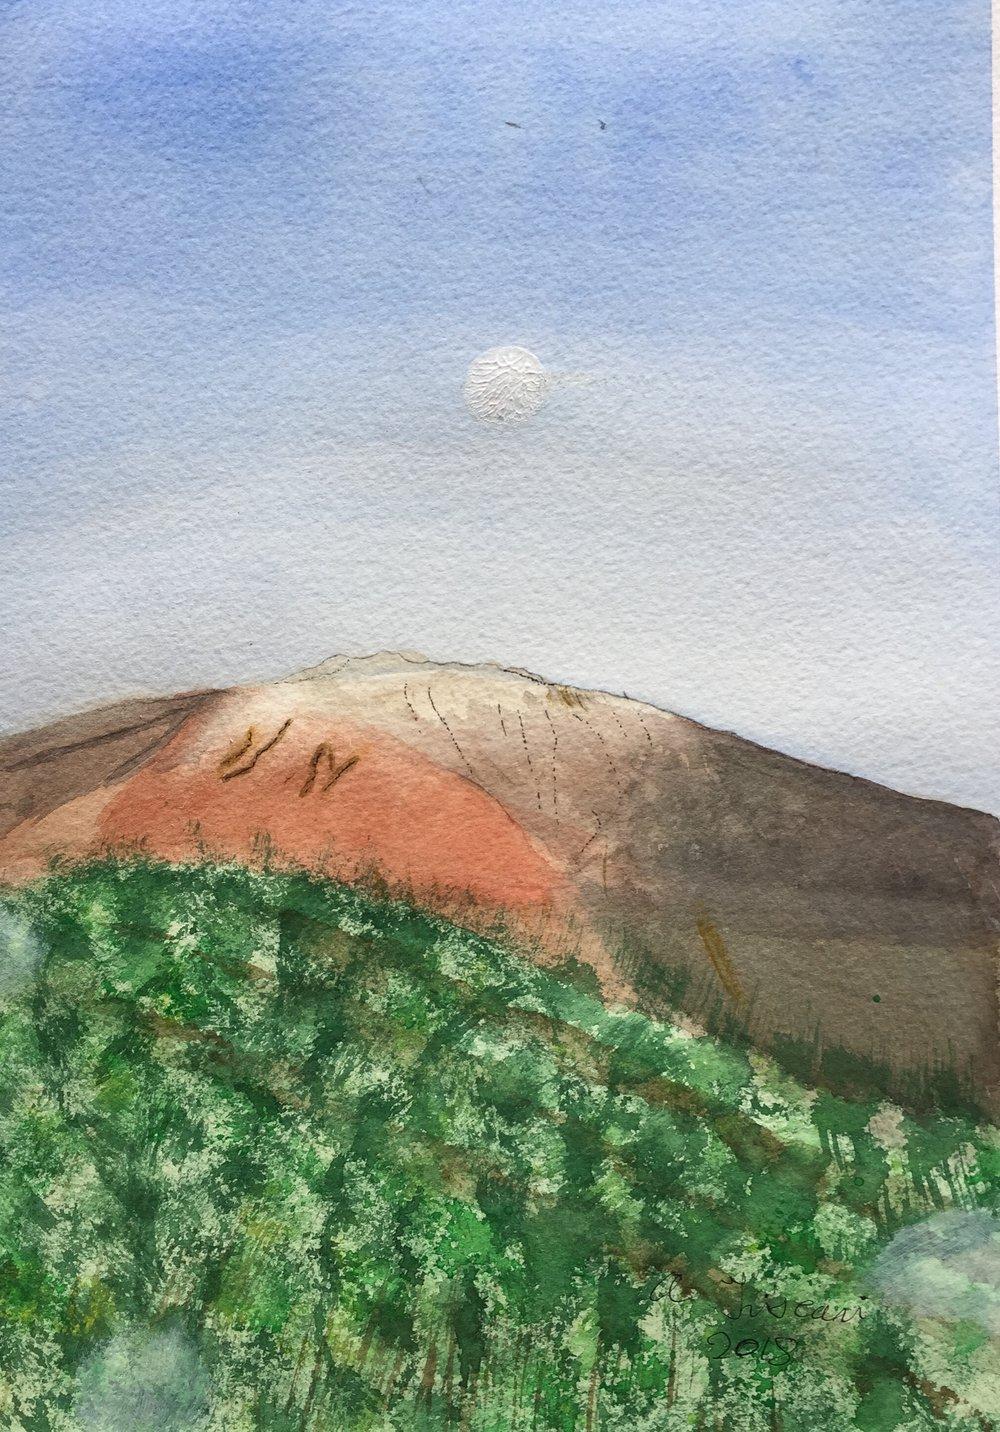 Tony Triscari mount etna.jpg